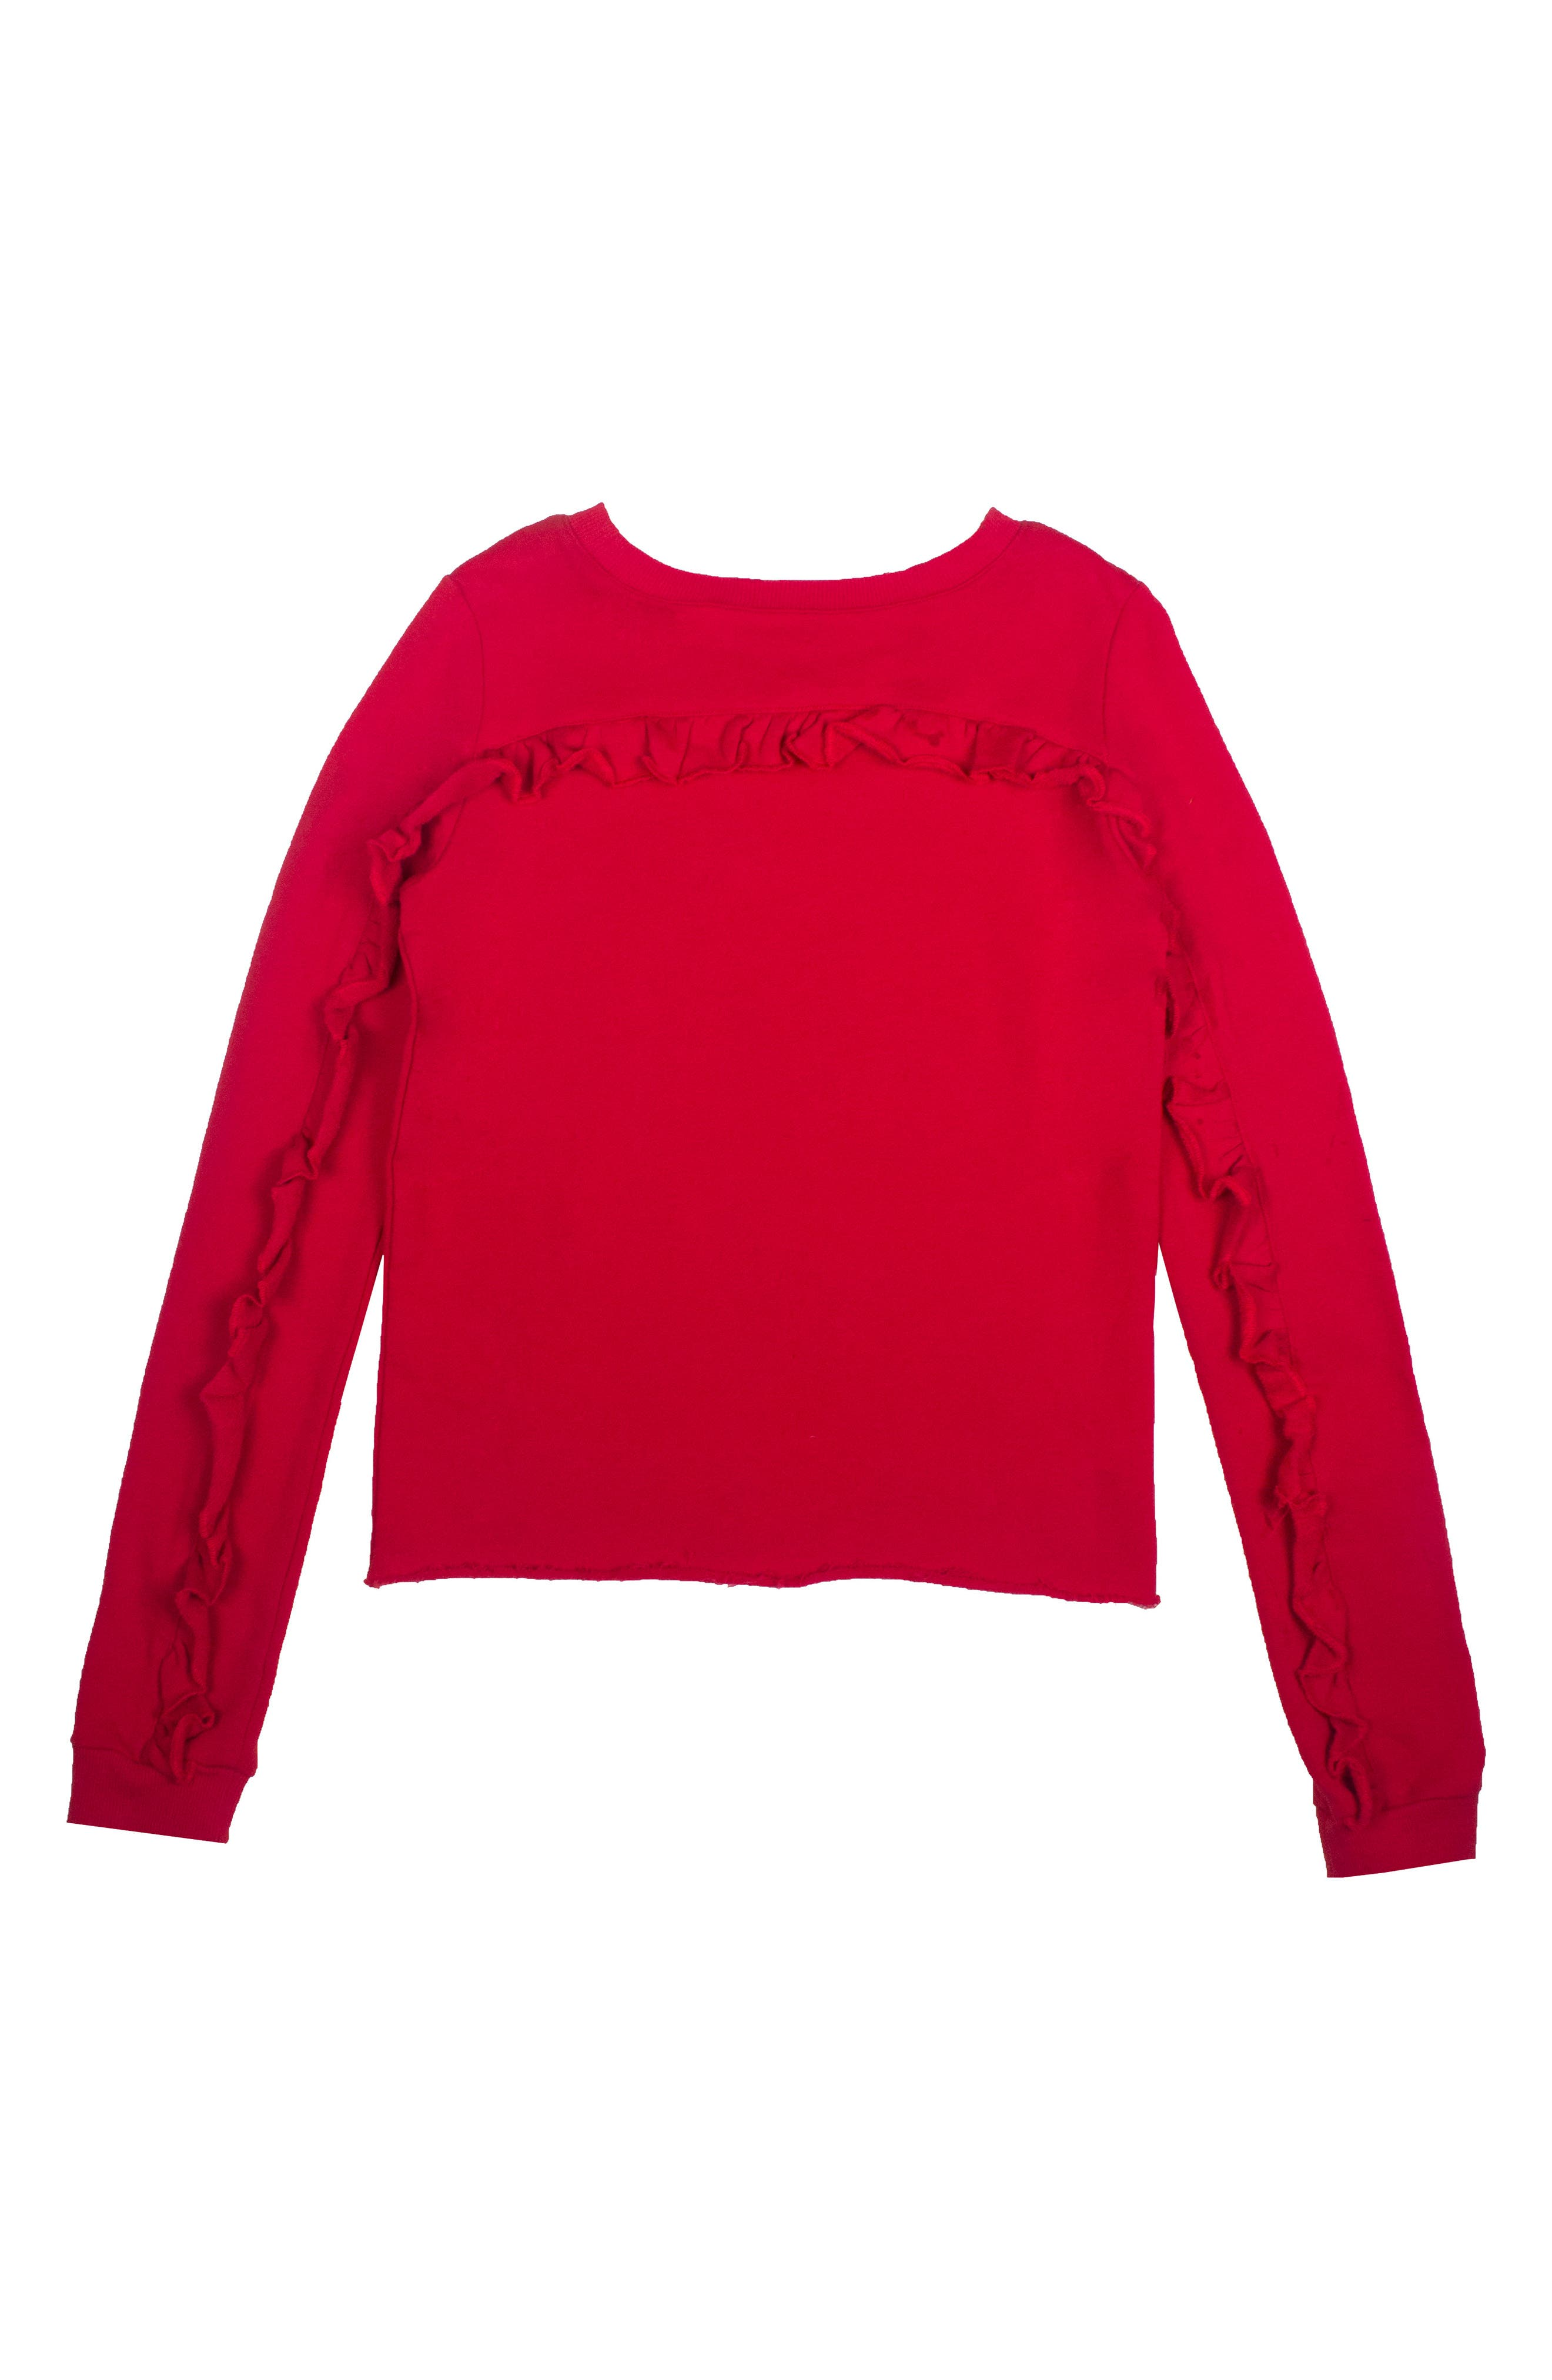 Ruffle Sweatshirt,                         Main,                         color, Red Rose